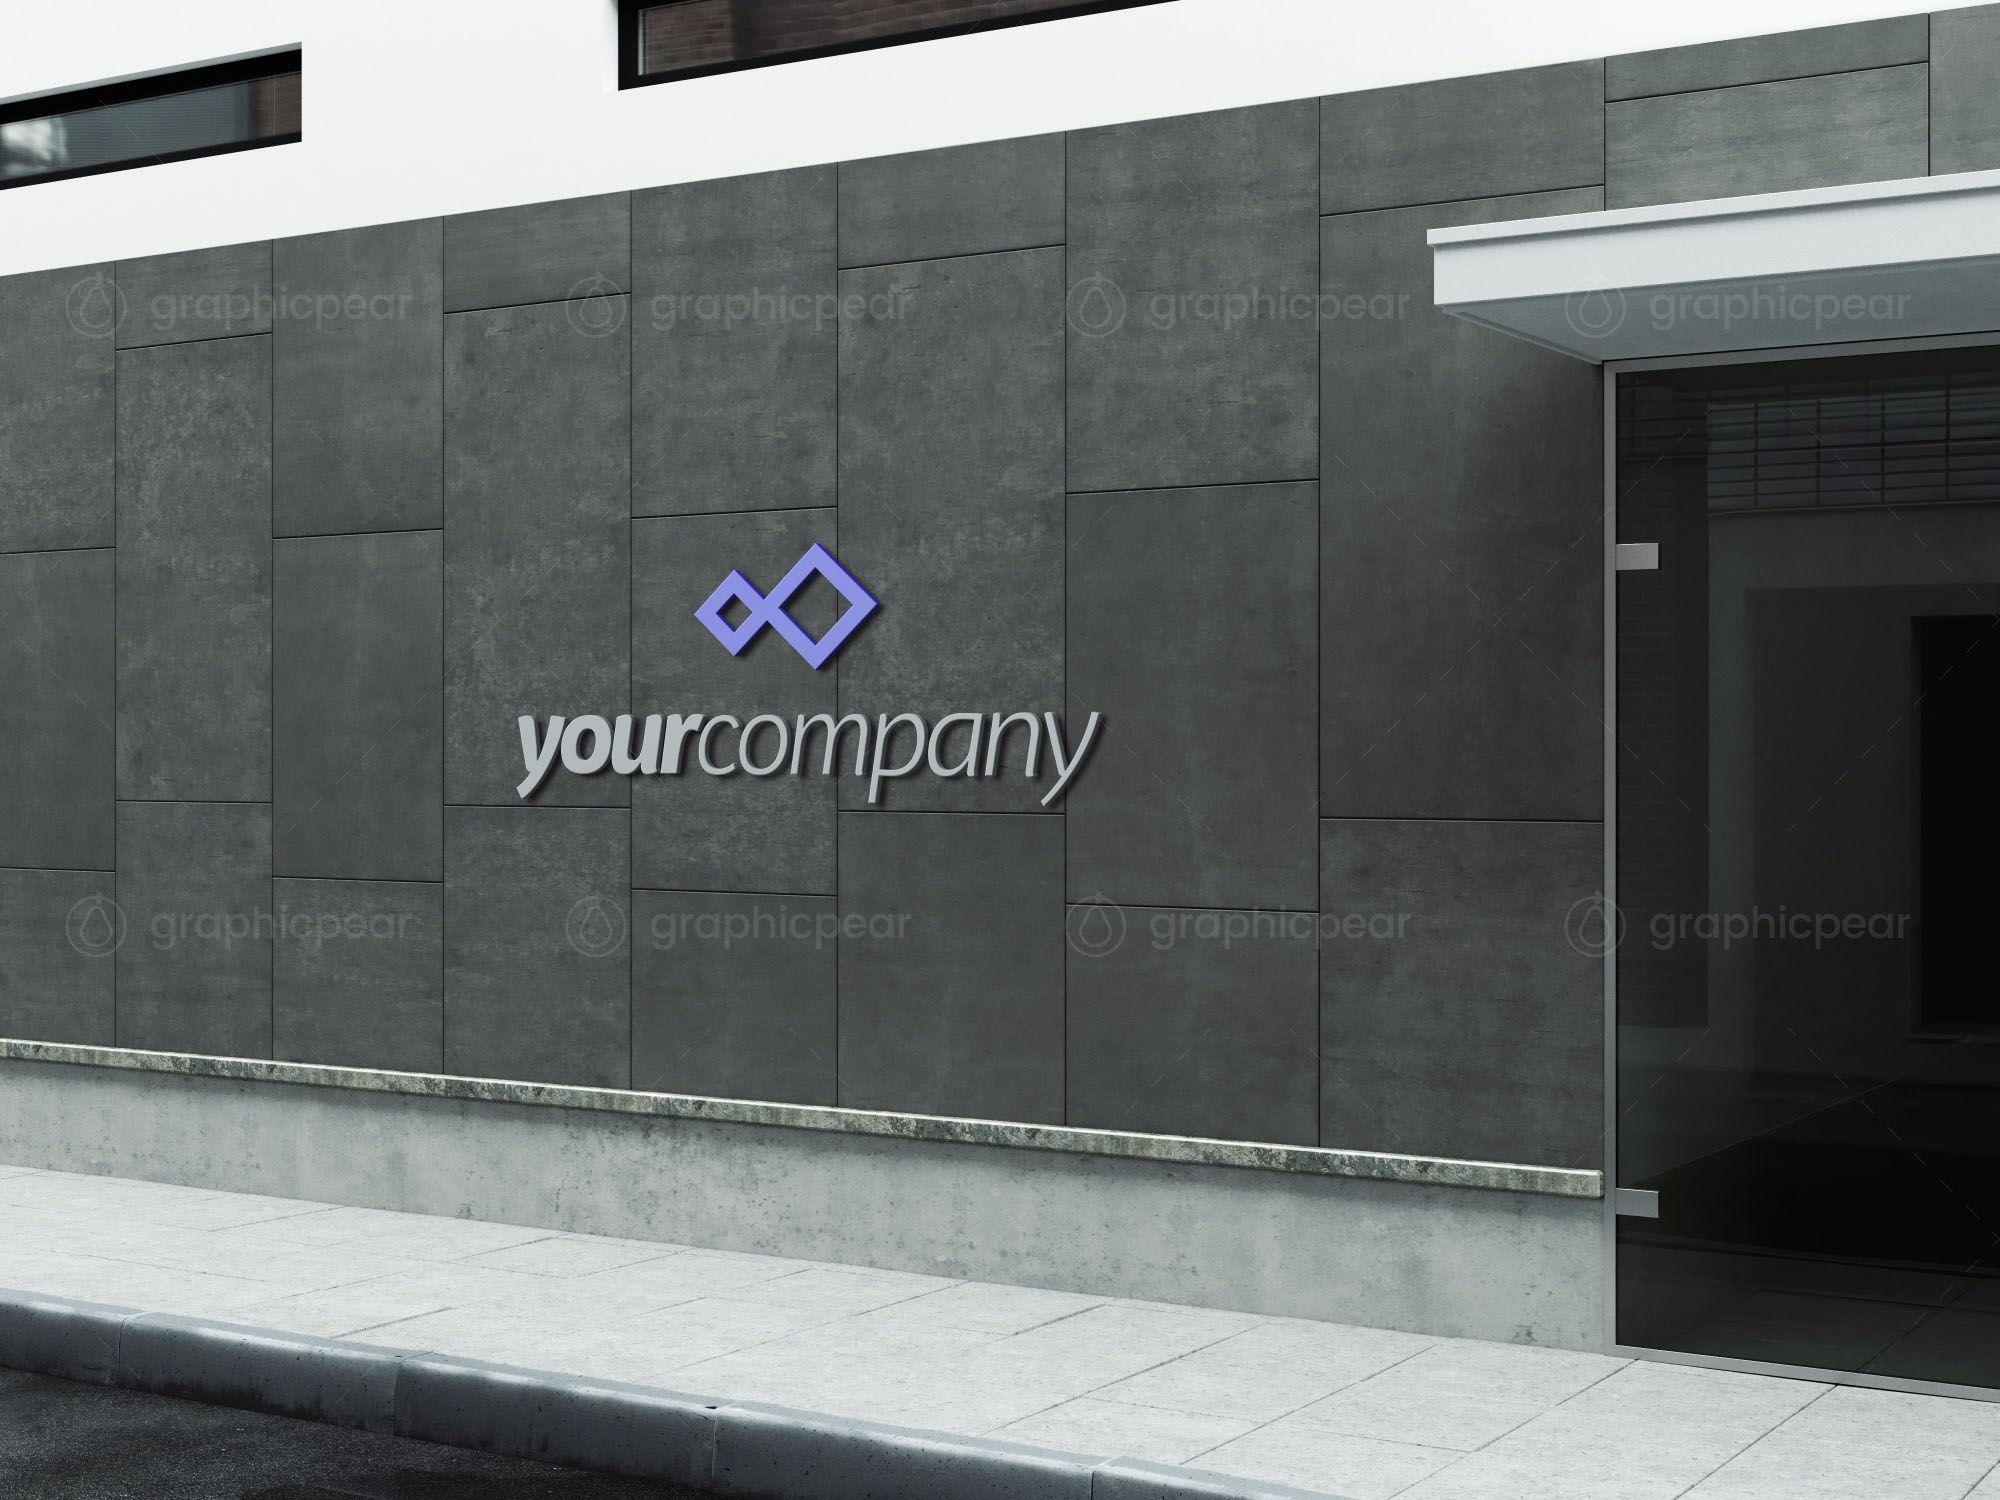 Company Building Sign Mockup In 2021 Sign Mockup Building Signs Mockup